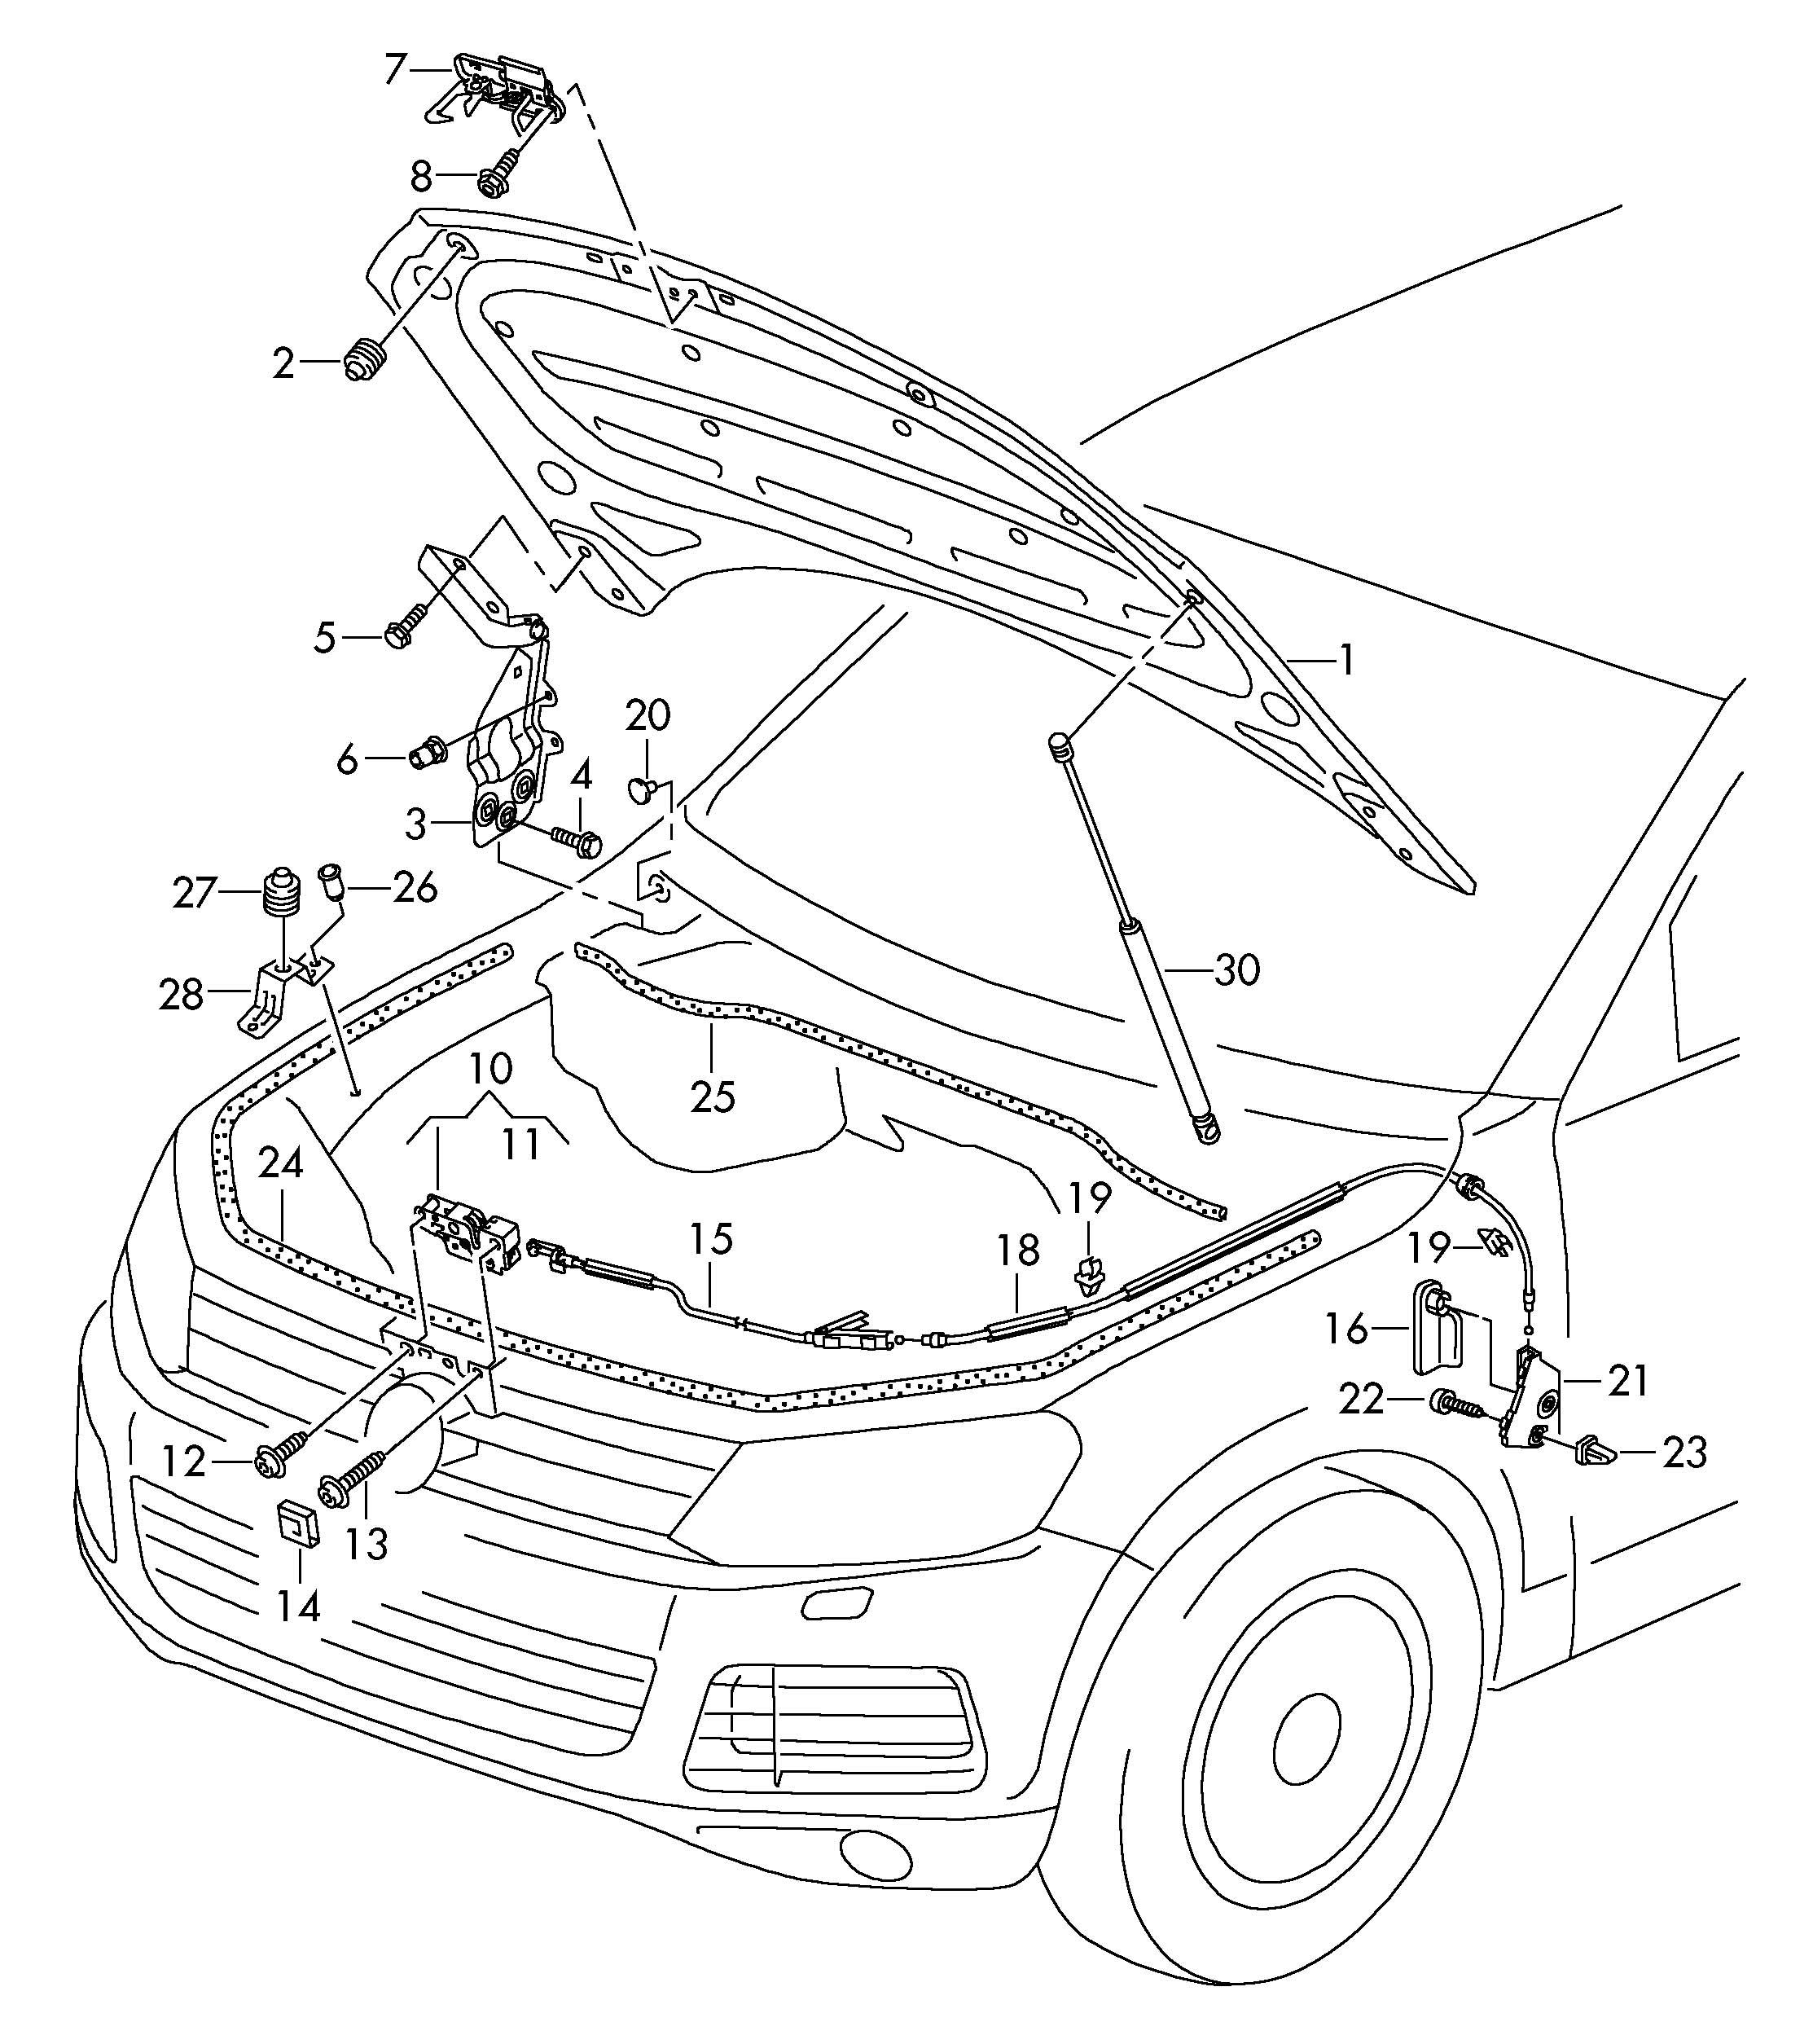 Volkswagen Touareg Bolt Hex Hd Combi Self Locking